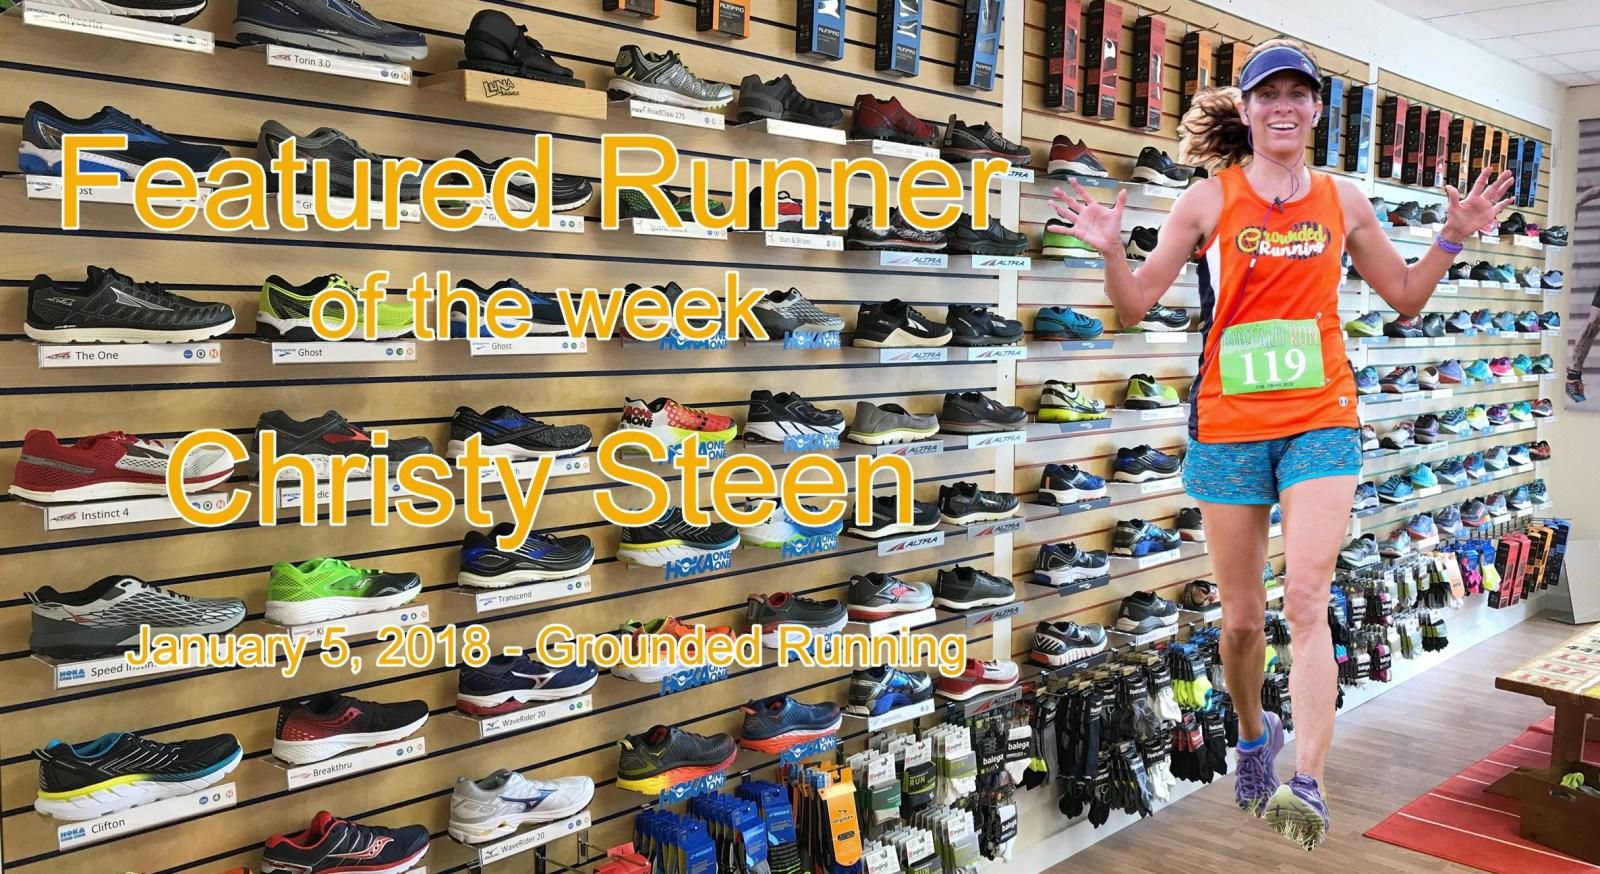 Christy Steen Featured Runner of the week